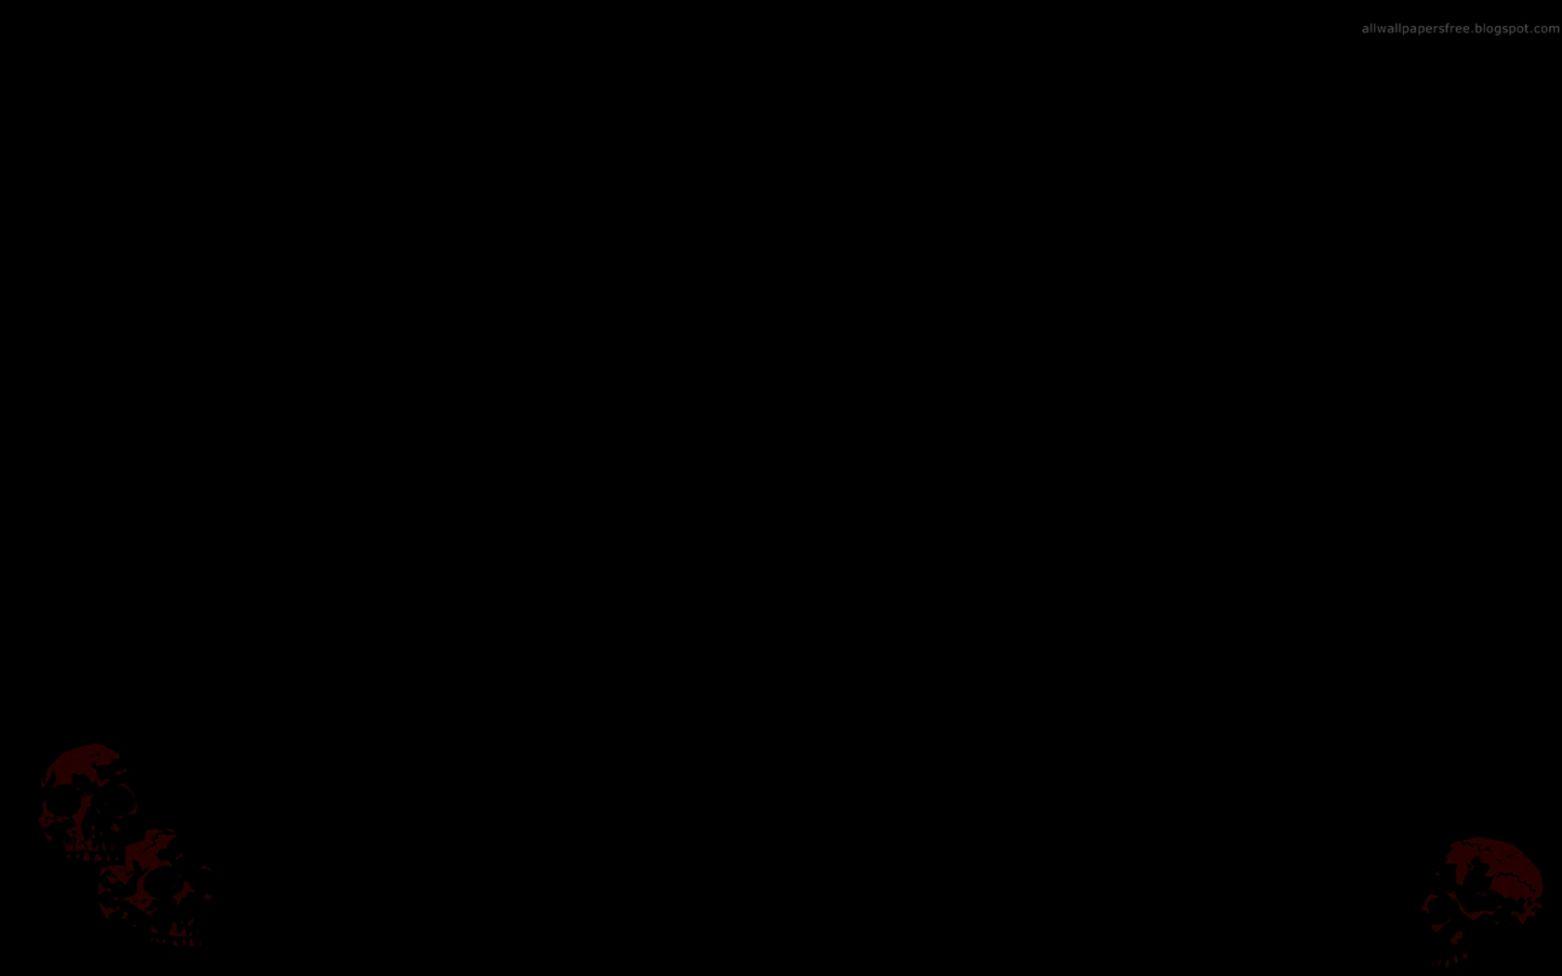 Solid Black Wallpaper 4k 1562x976